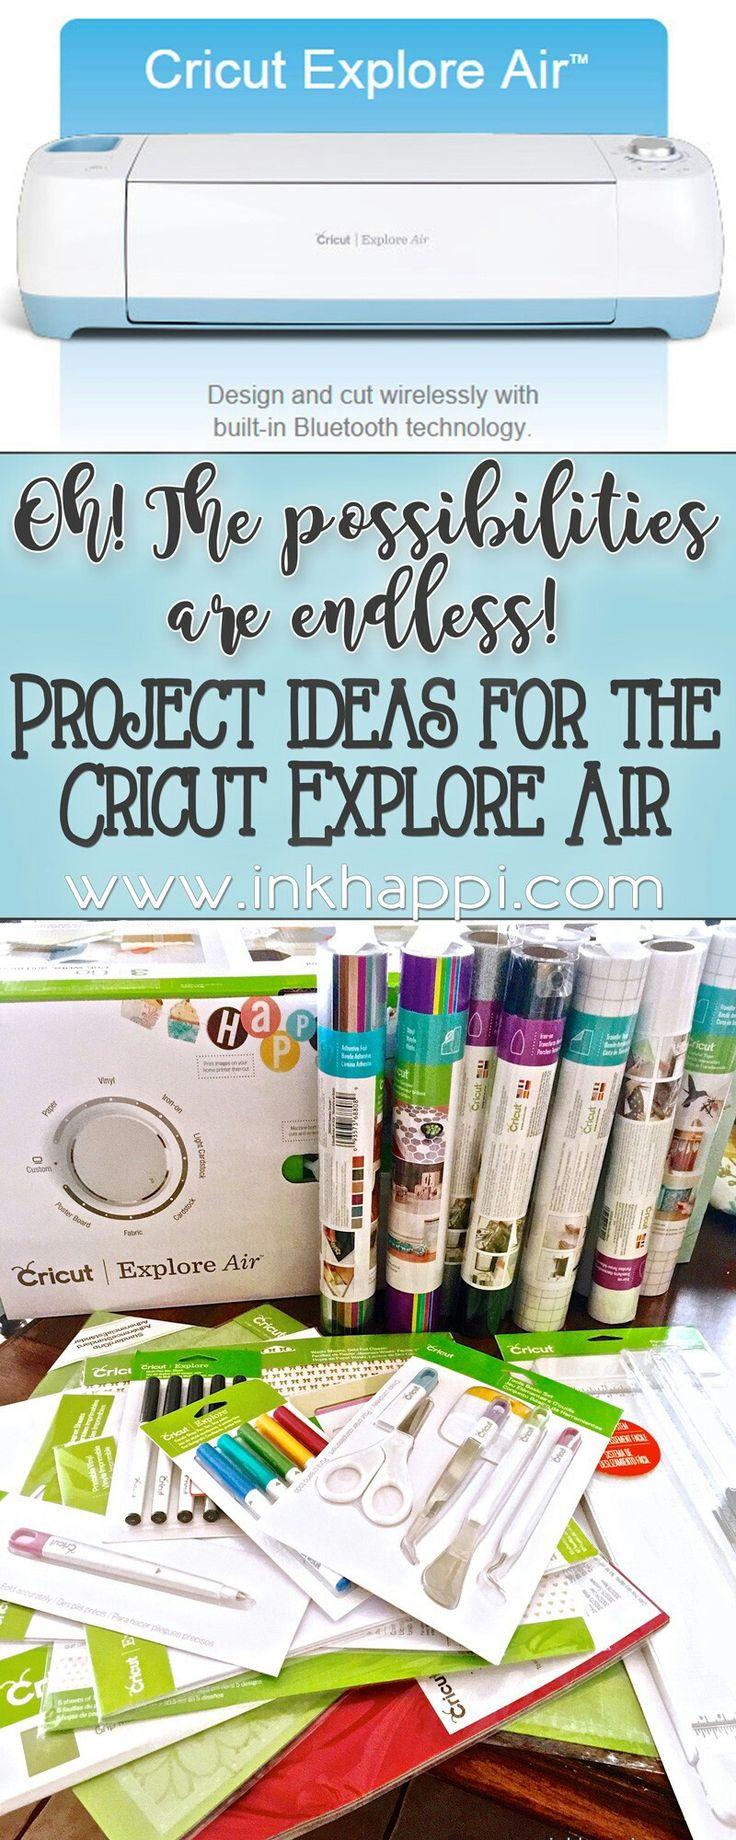 Project Ideas for the Cricut Explore Air